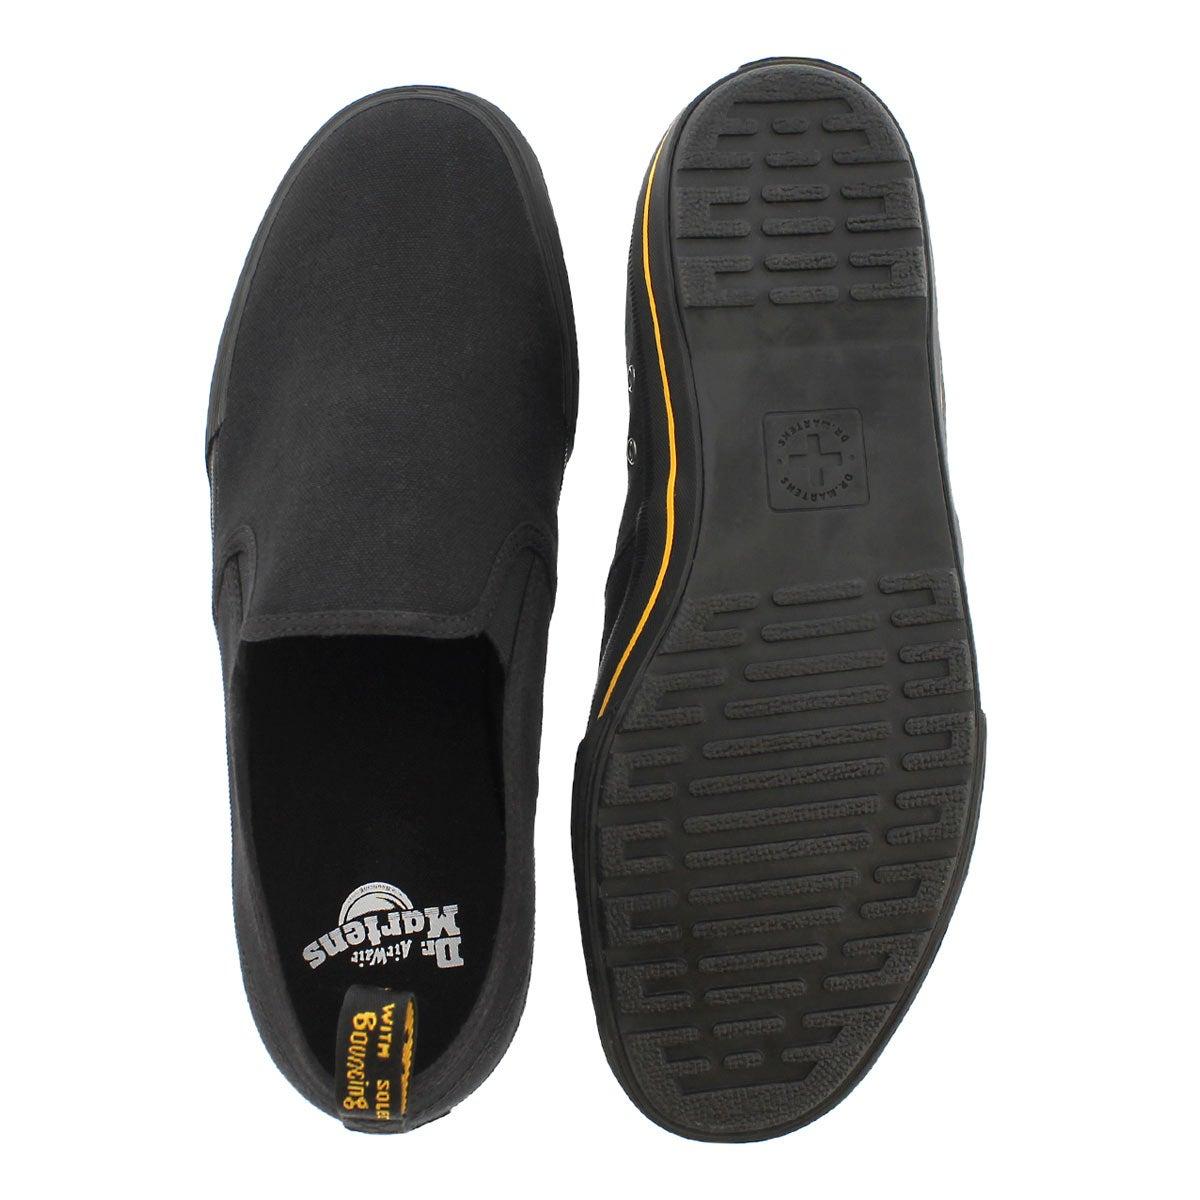 Mns Toomey black slip on shoe